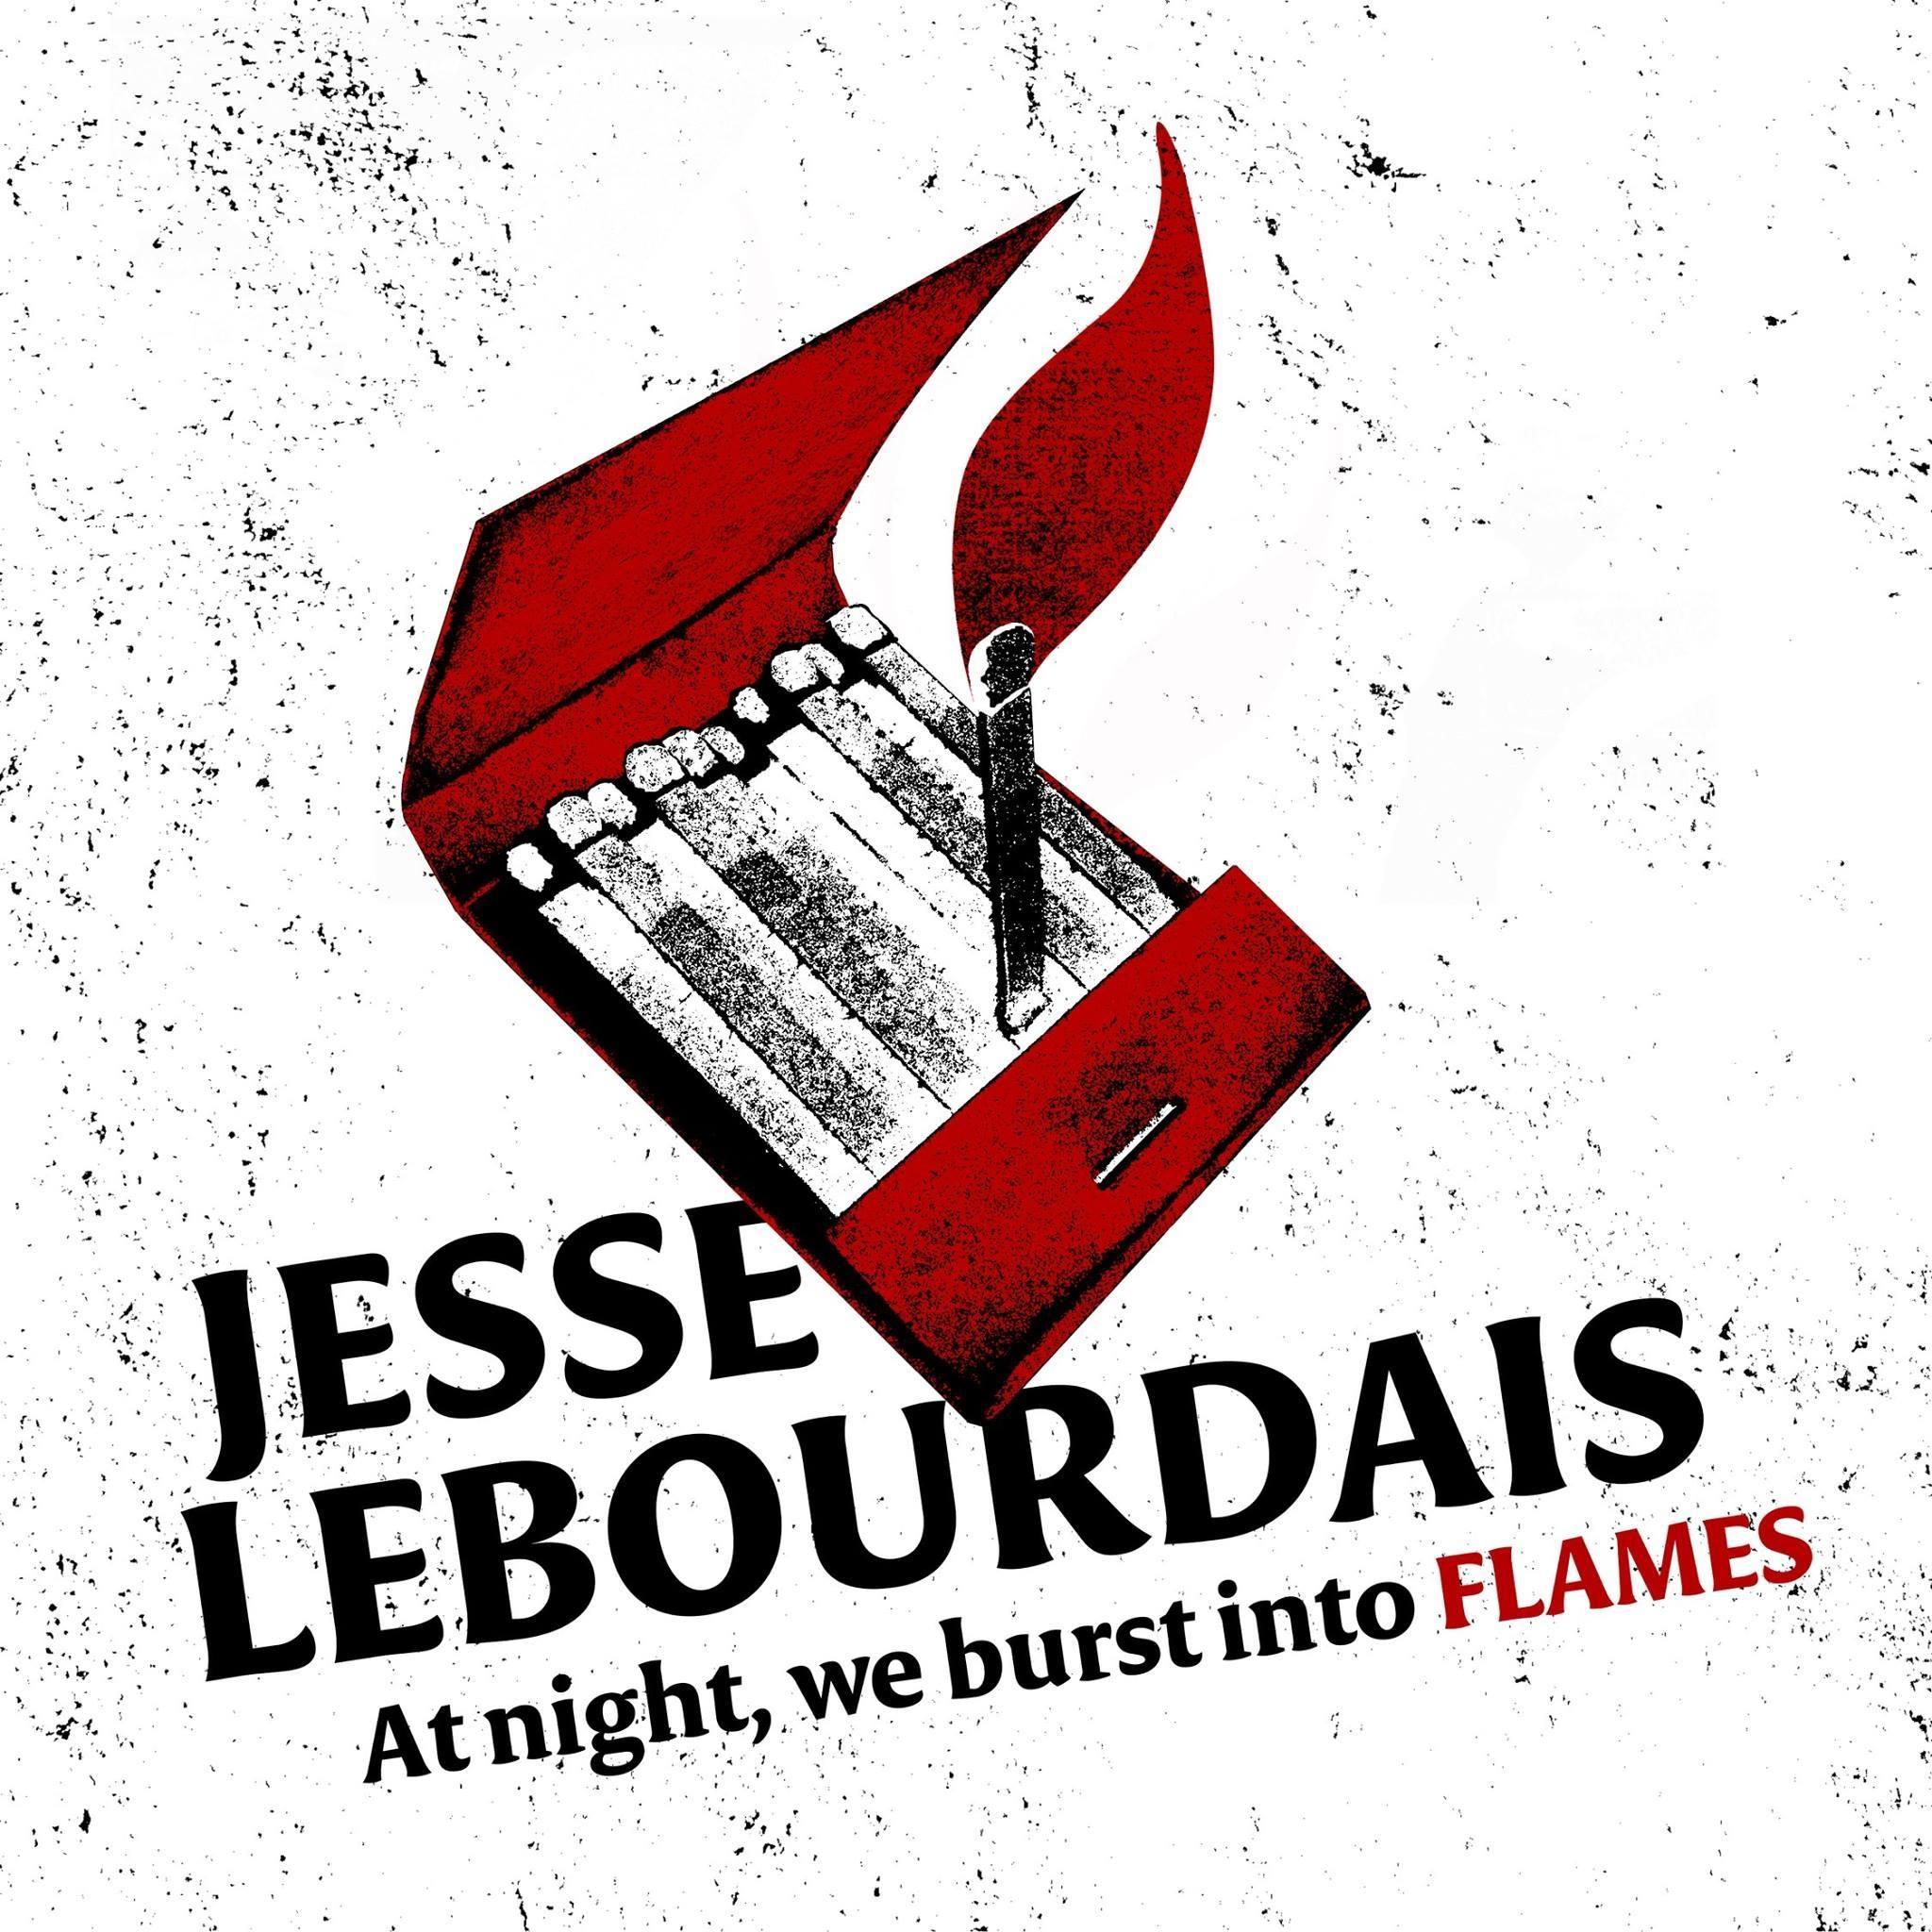 NXNE:Jesse Labourdais * 4am Last Call